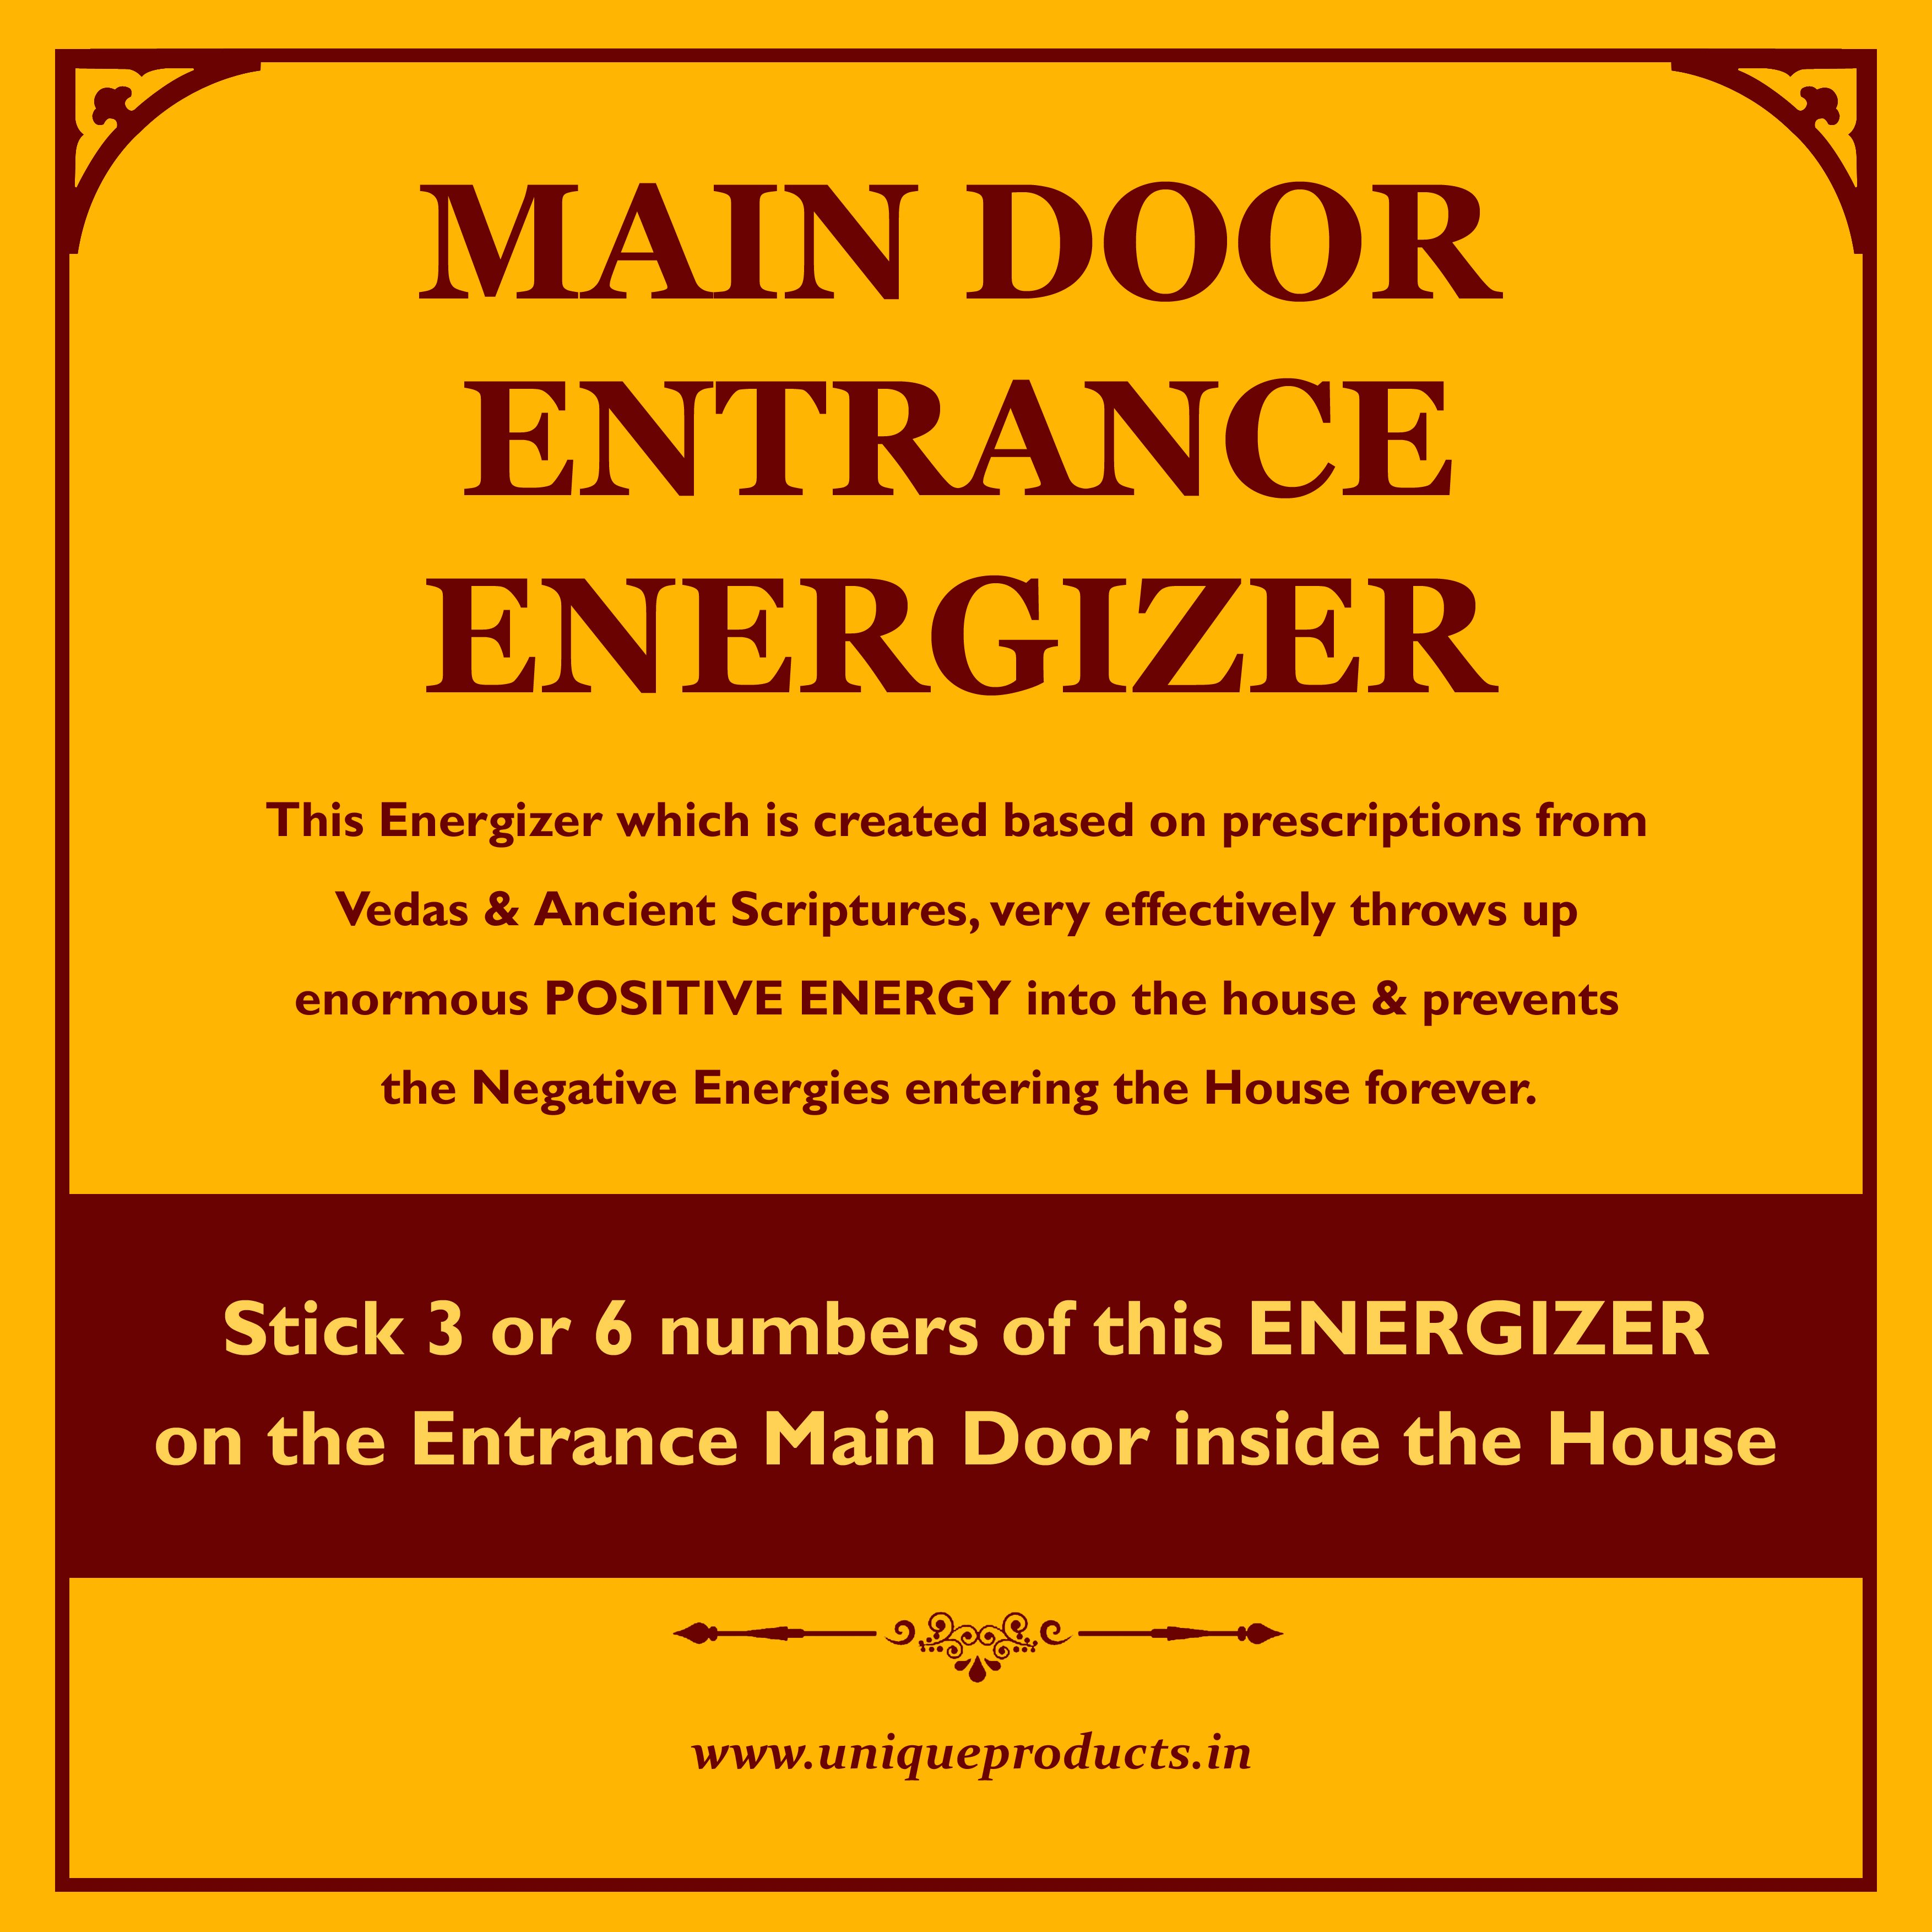 According to Hindu Vastu Shastra, the Main Entrance Energy of a ...